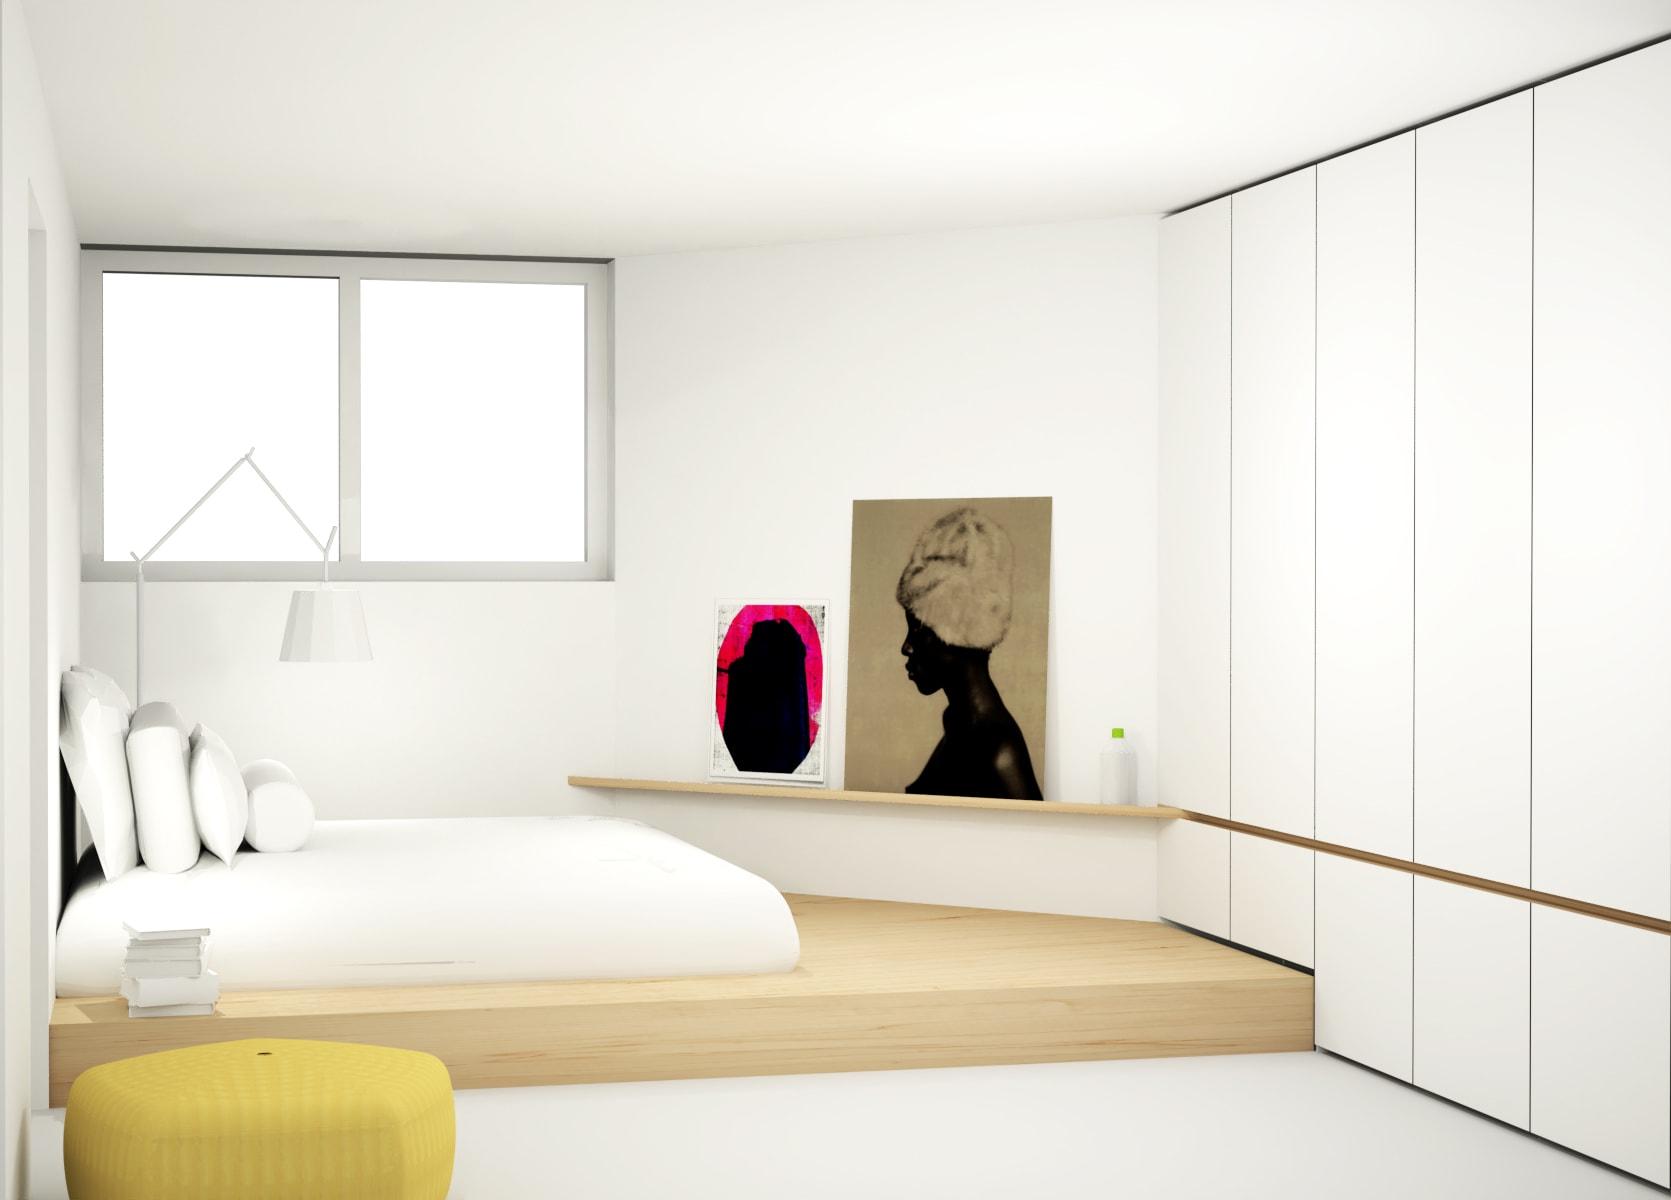 Lichte slaapkamer met stijlvolle kastenwand